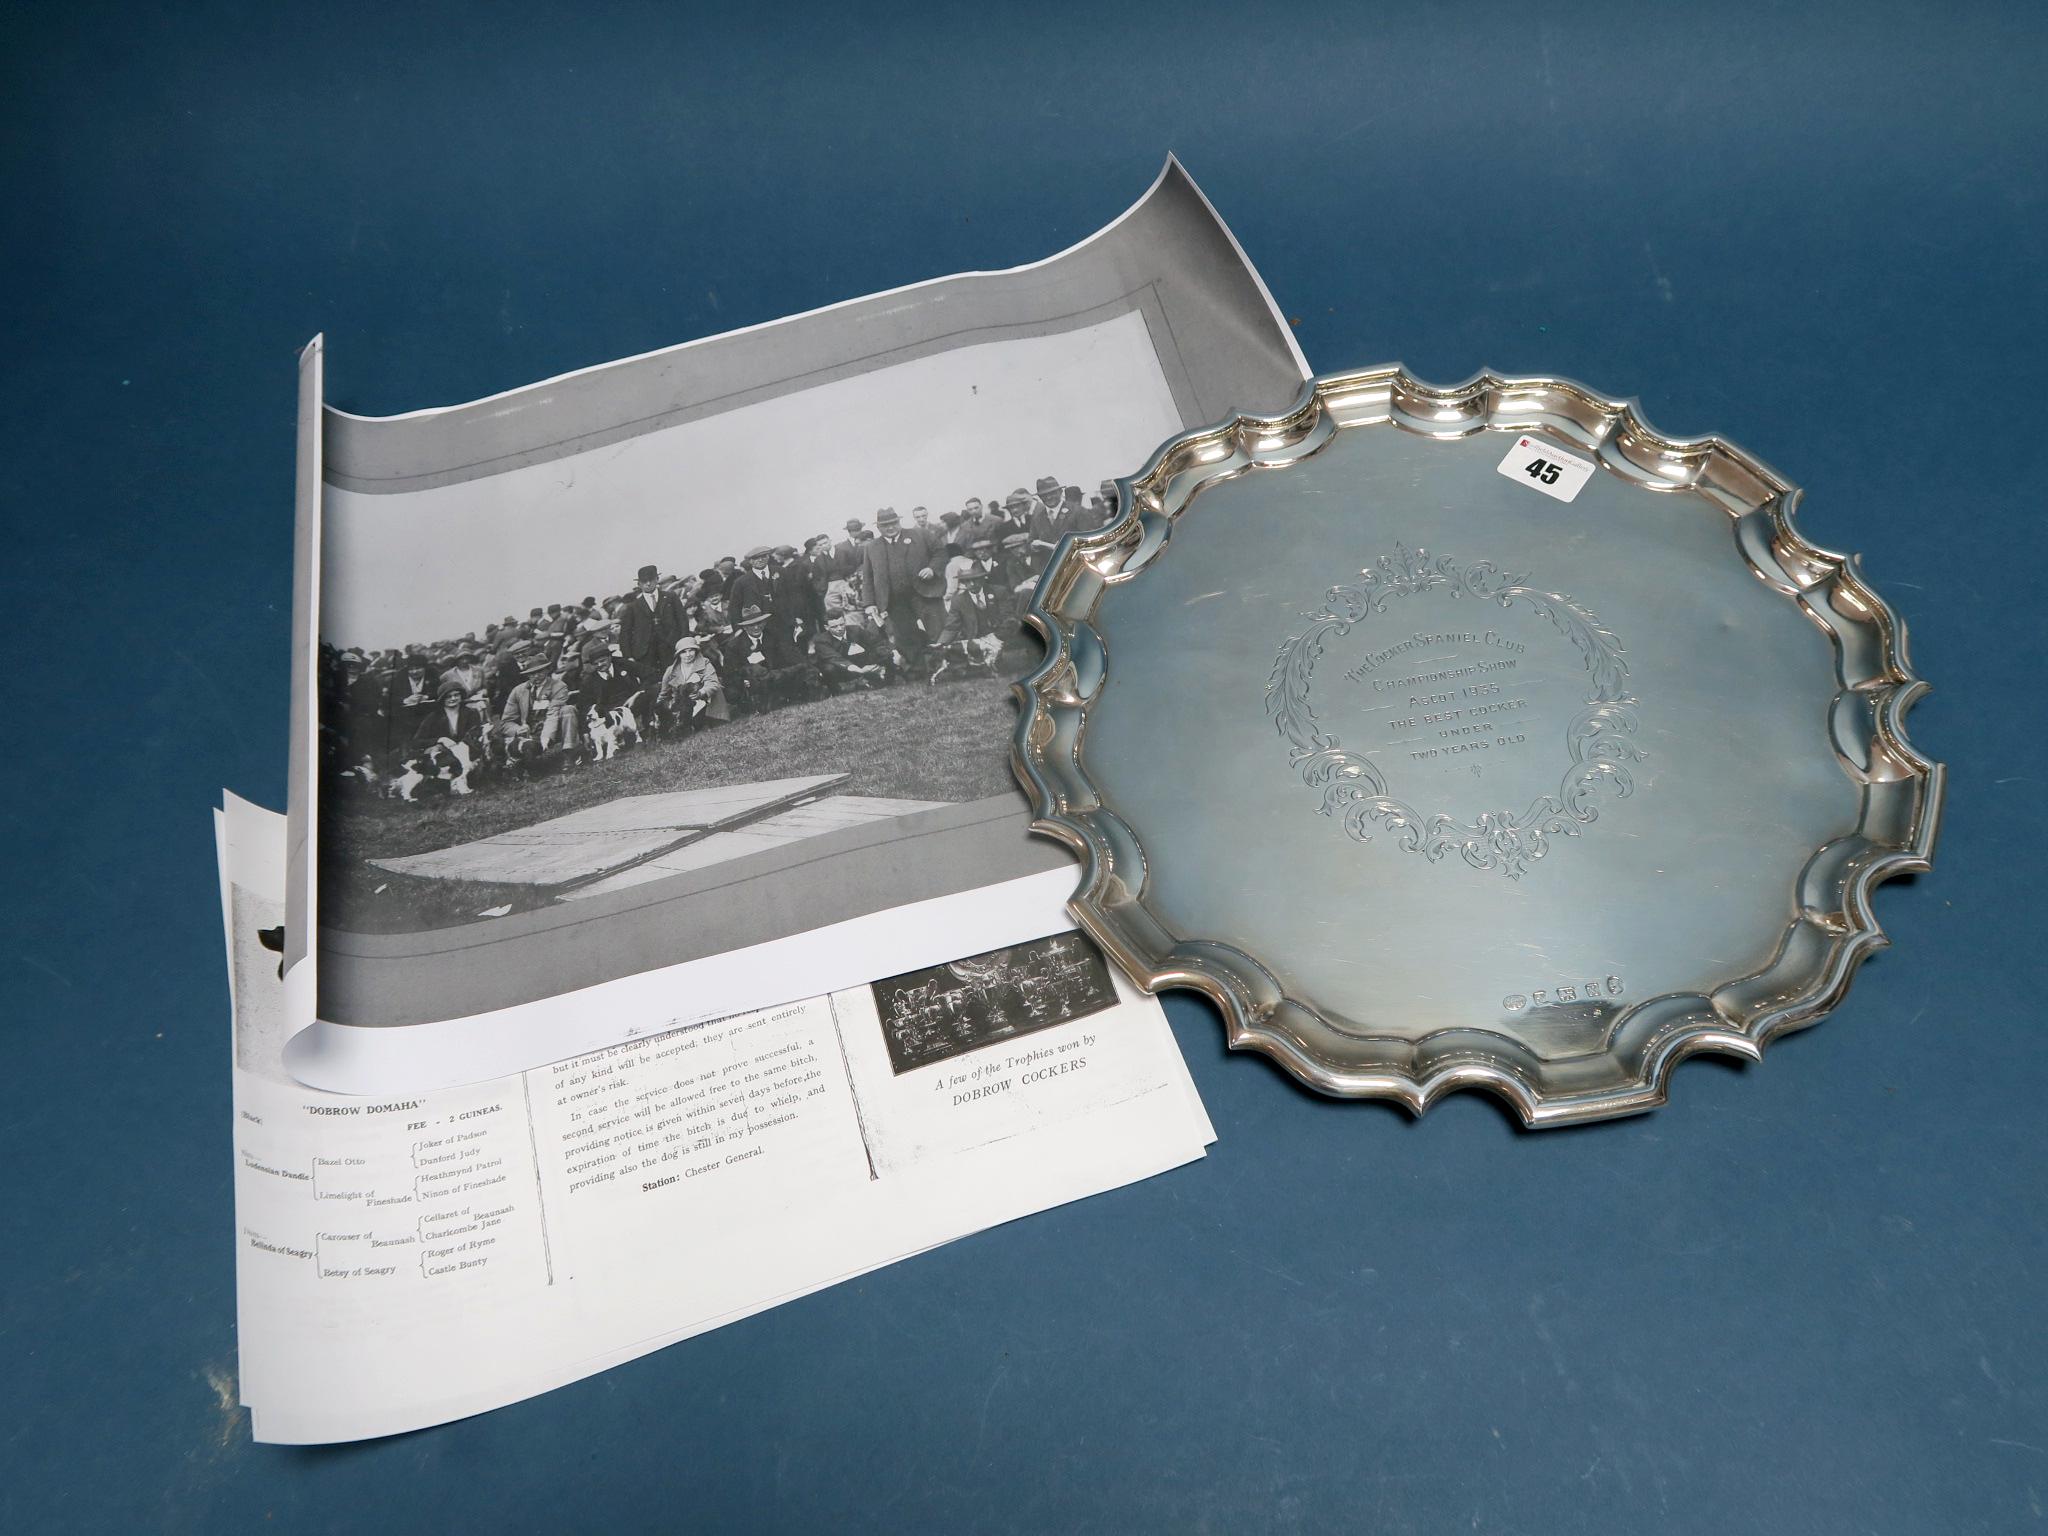 Lot 45 - A Hallmarked Silver Salver, Alexander Clark & Co, Birmingham 1934, of shaped circular form, engraved